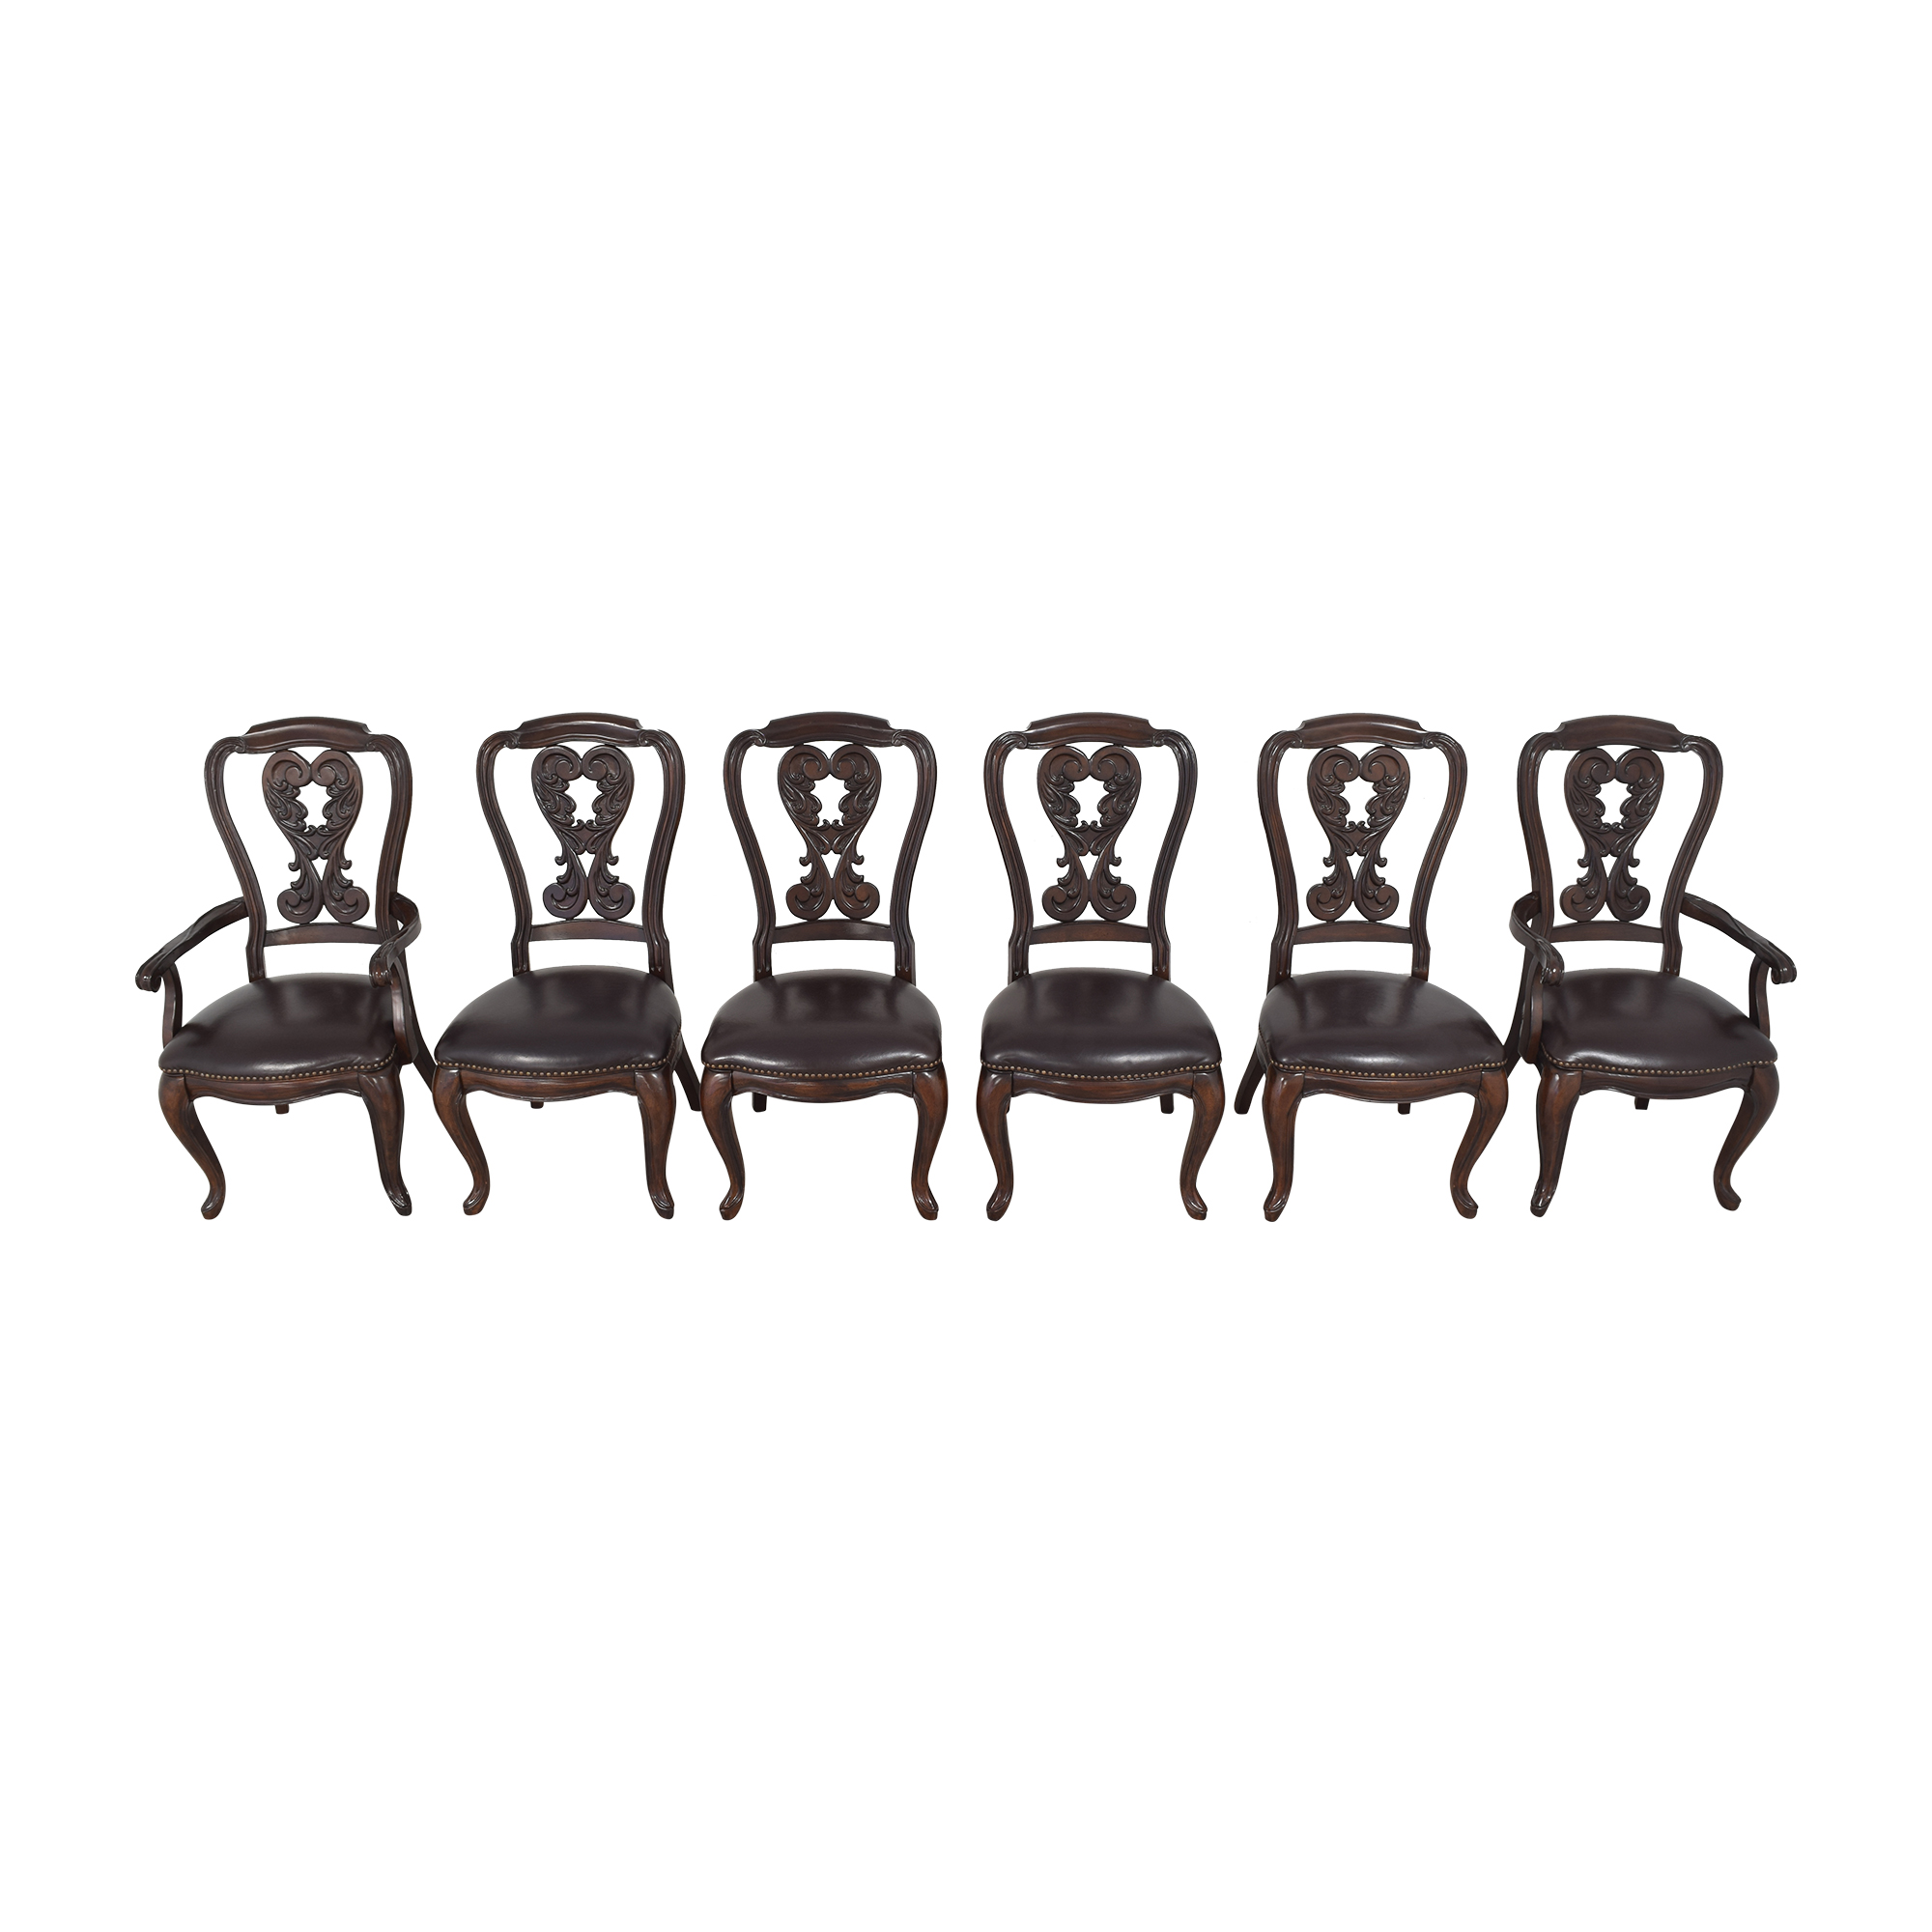 shop Markor International Dining Chairs Markor International Dining Chairs